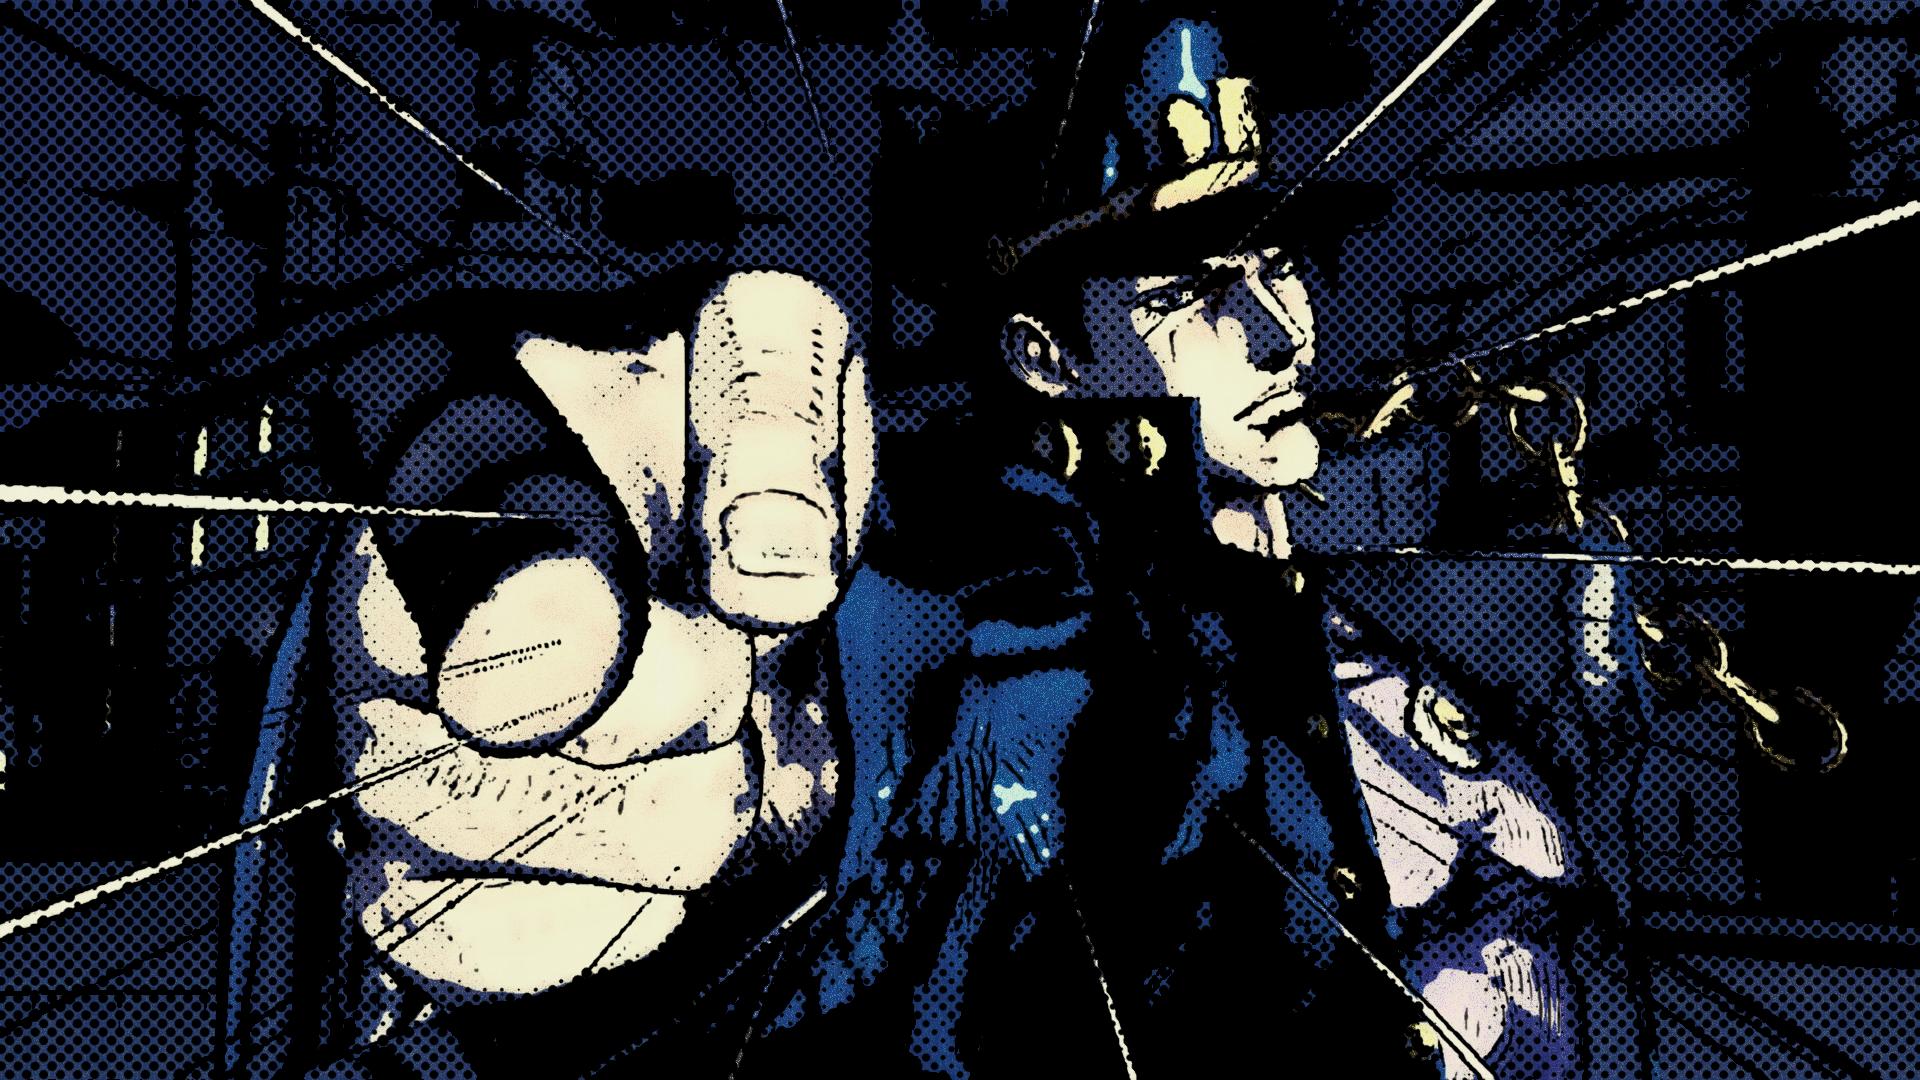 Jojo S Bizarre Adventure Hd Wallpaper Background Image 1920x1080 Id 981537 Wallpaper Abyss